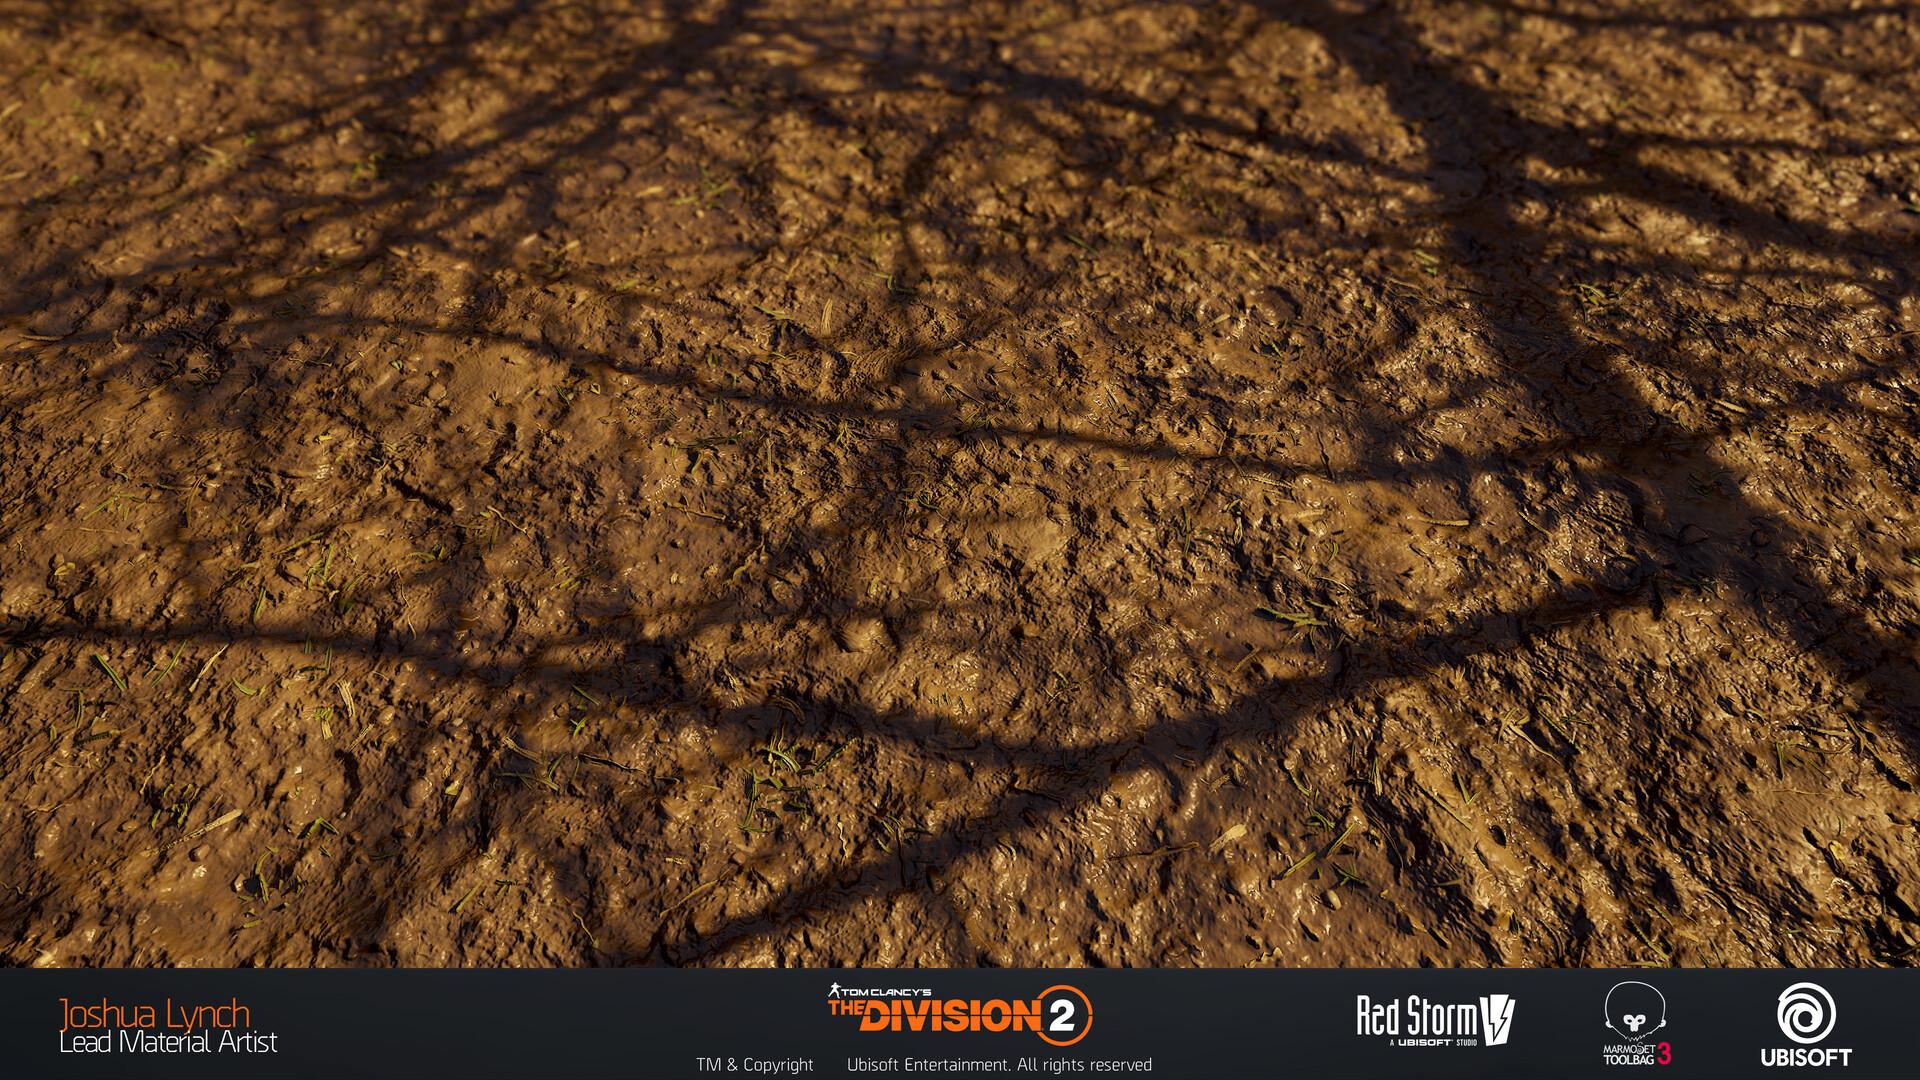 Joshua lynch division 2 josh lynch trampled mud ground